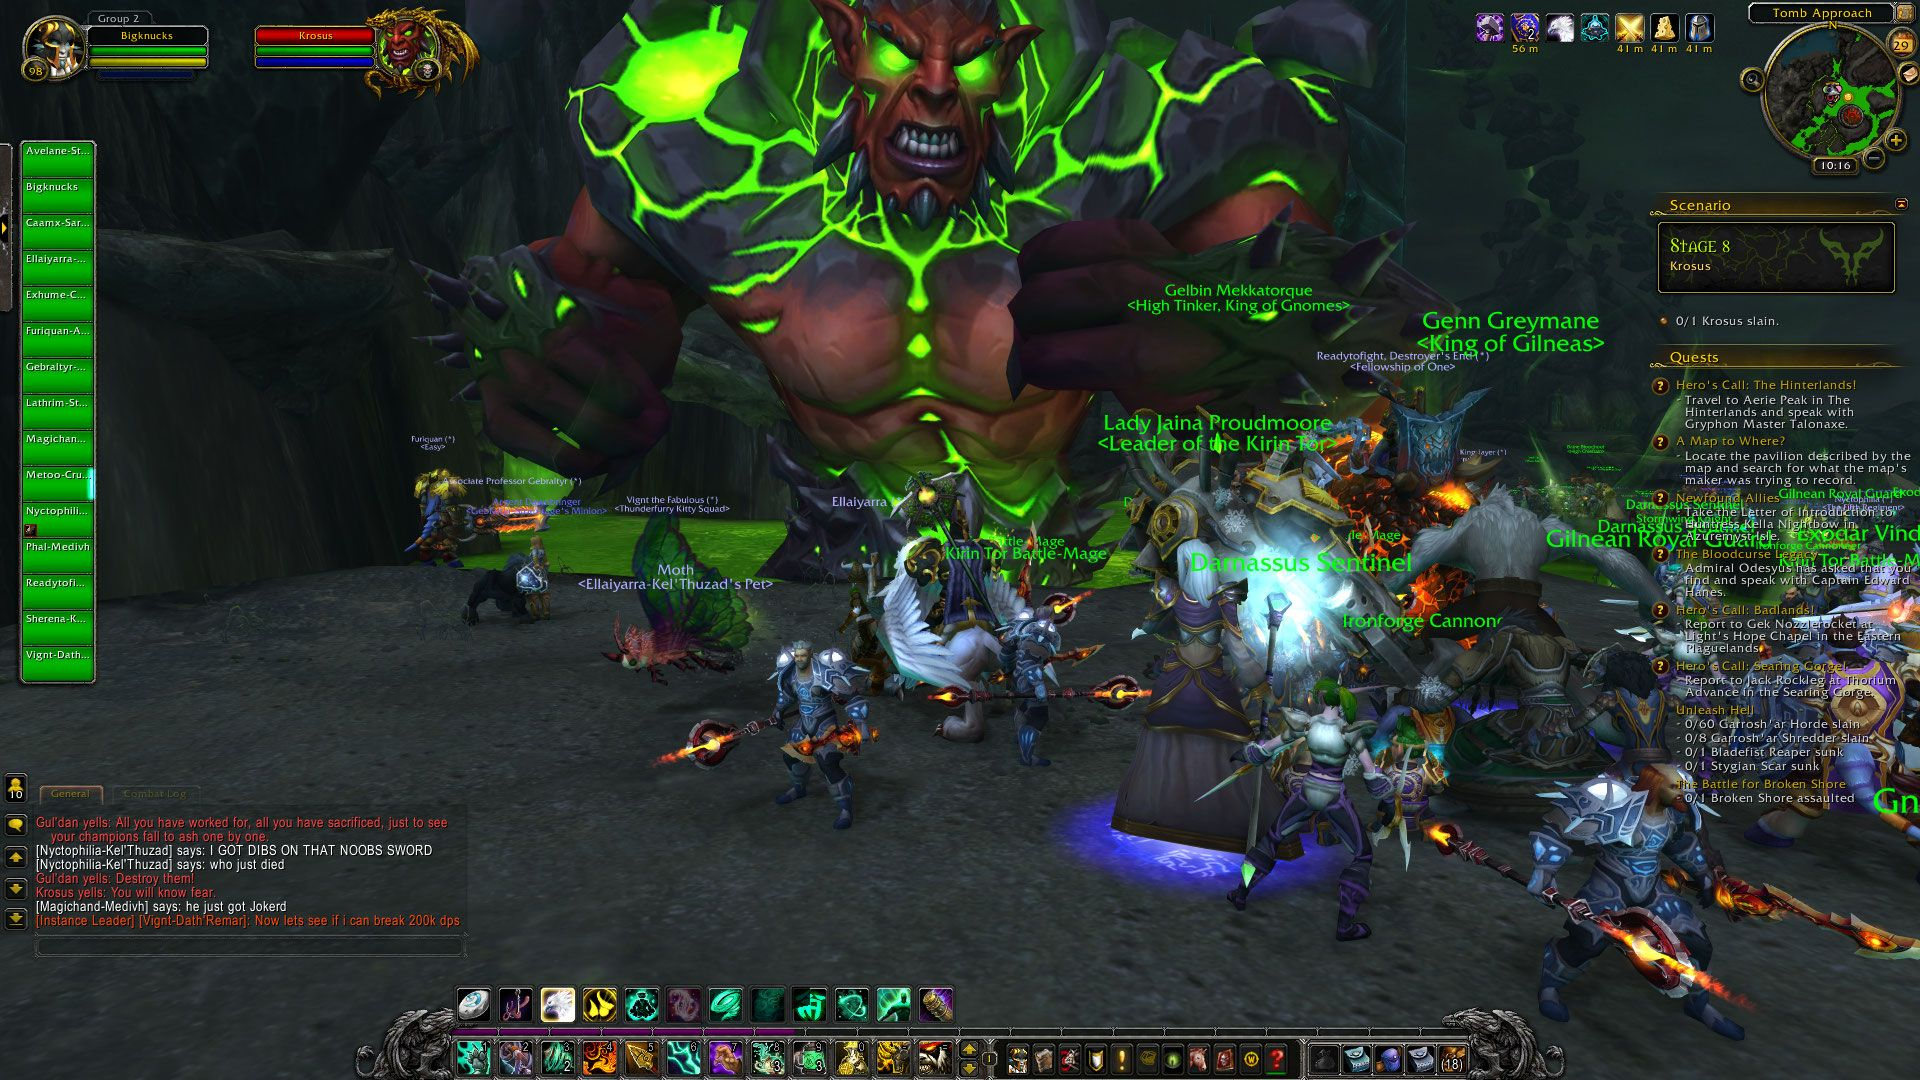 World Of Warcraft Classic Revealed For Those That Like Vanilla